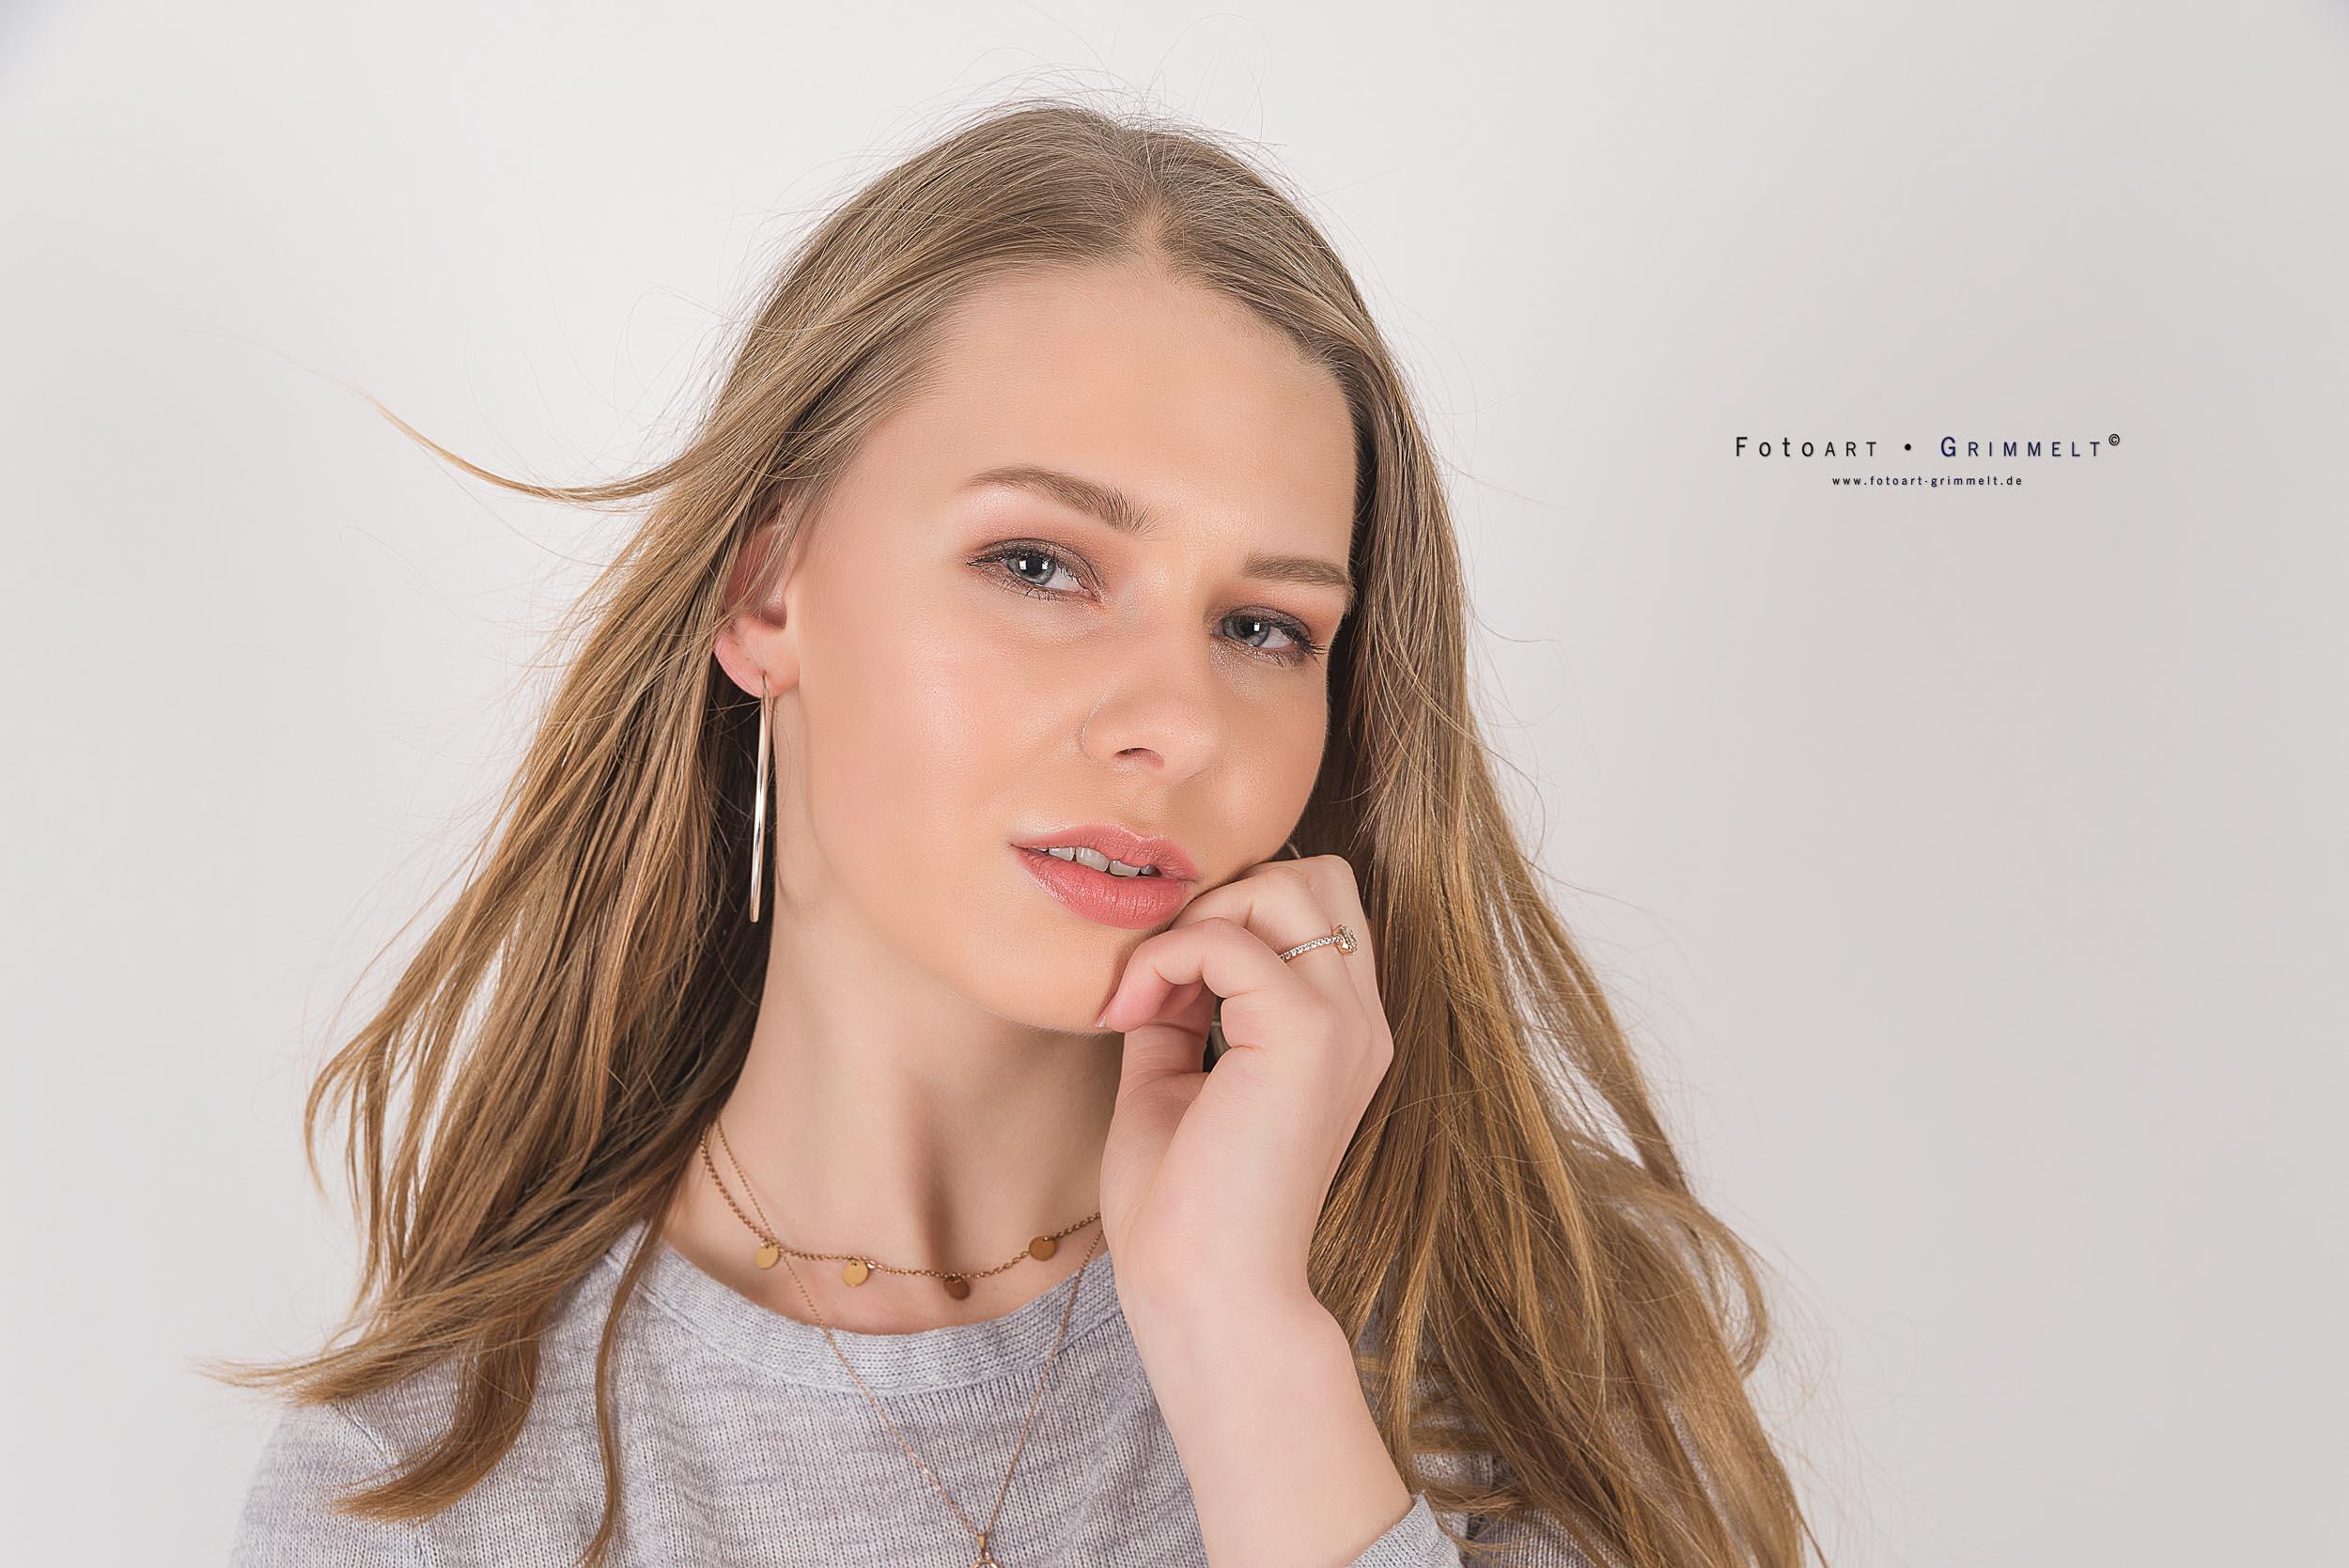 Nina Himmel